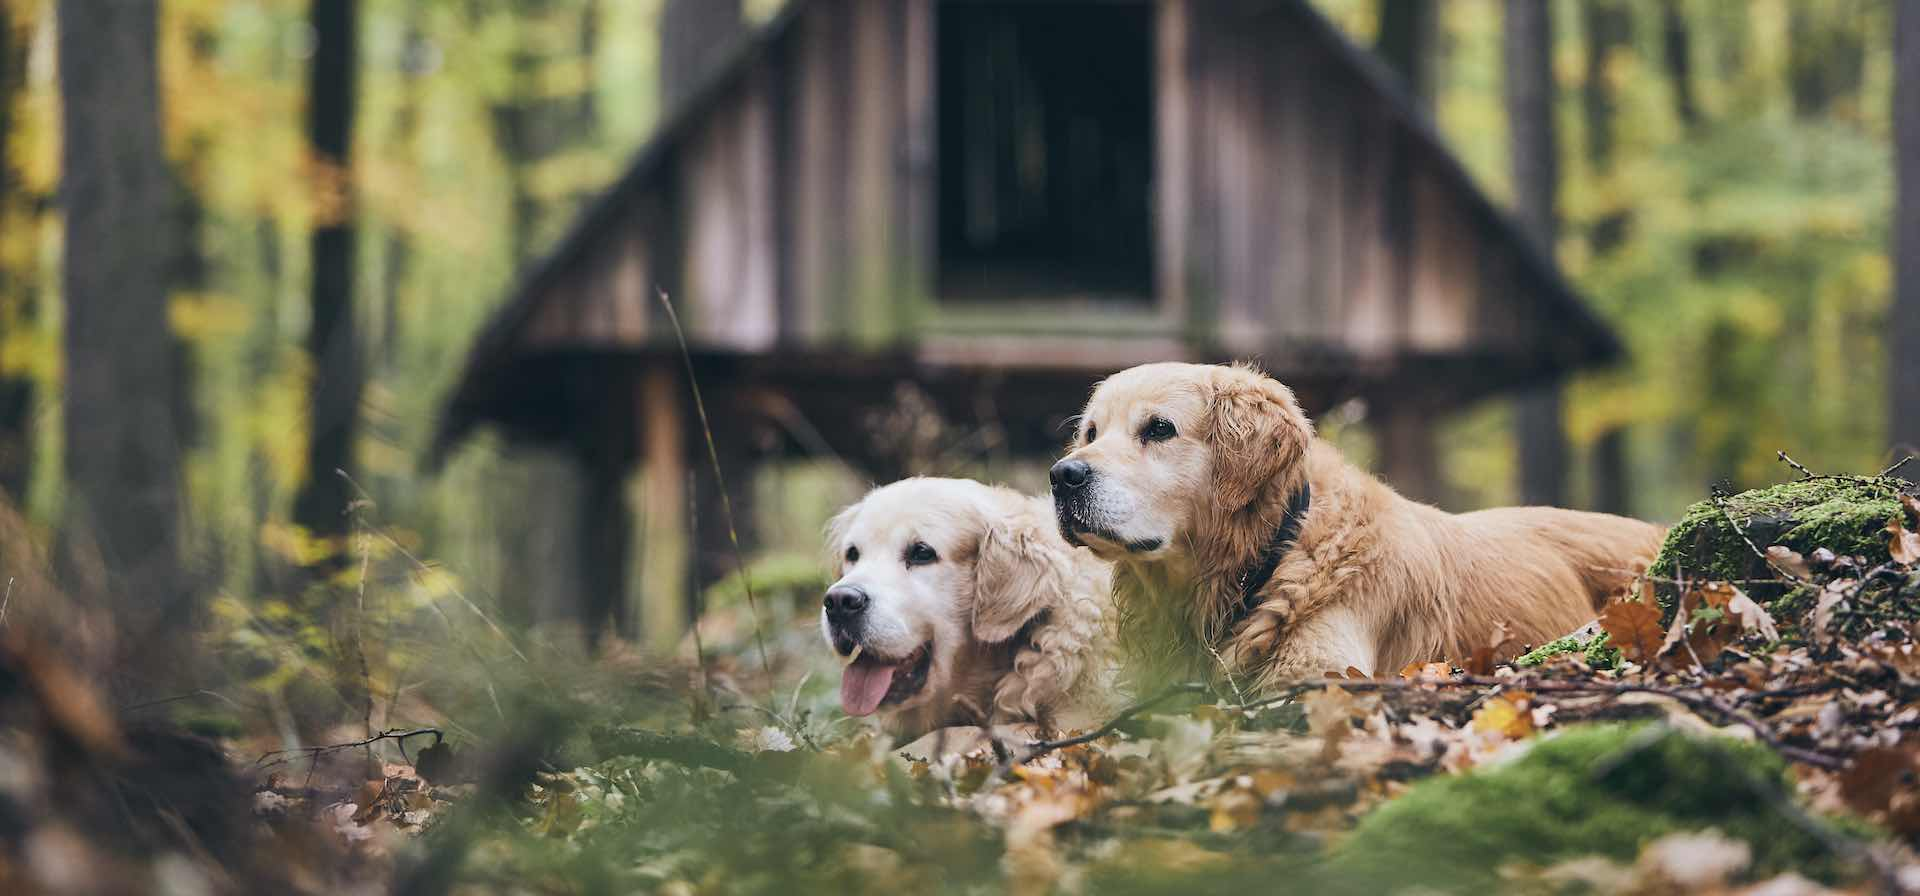 incontri doggami